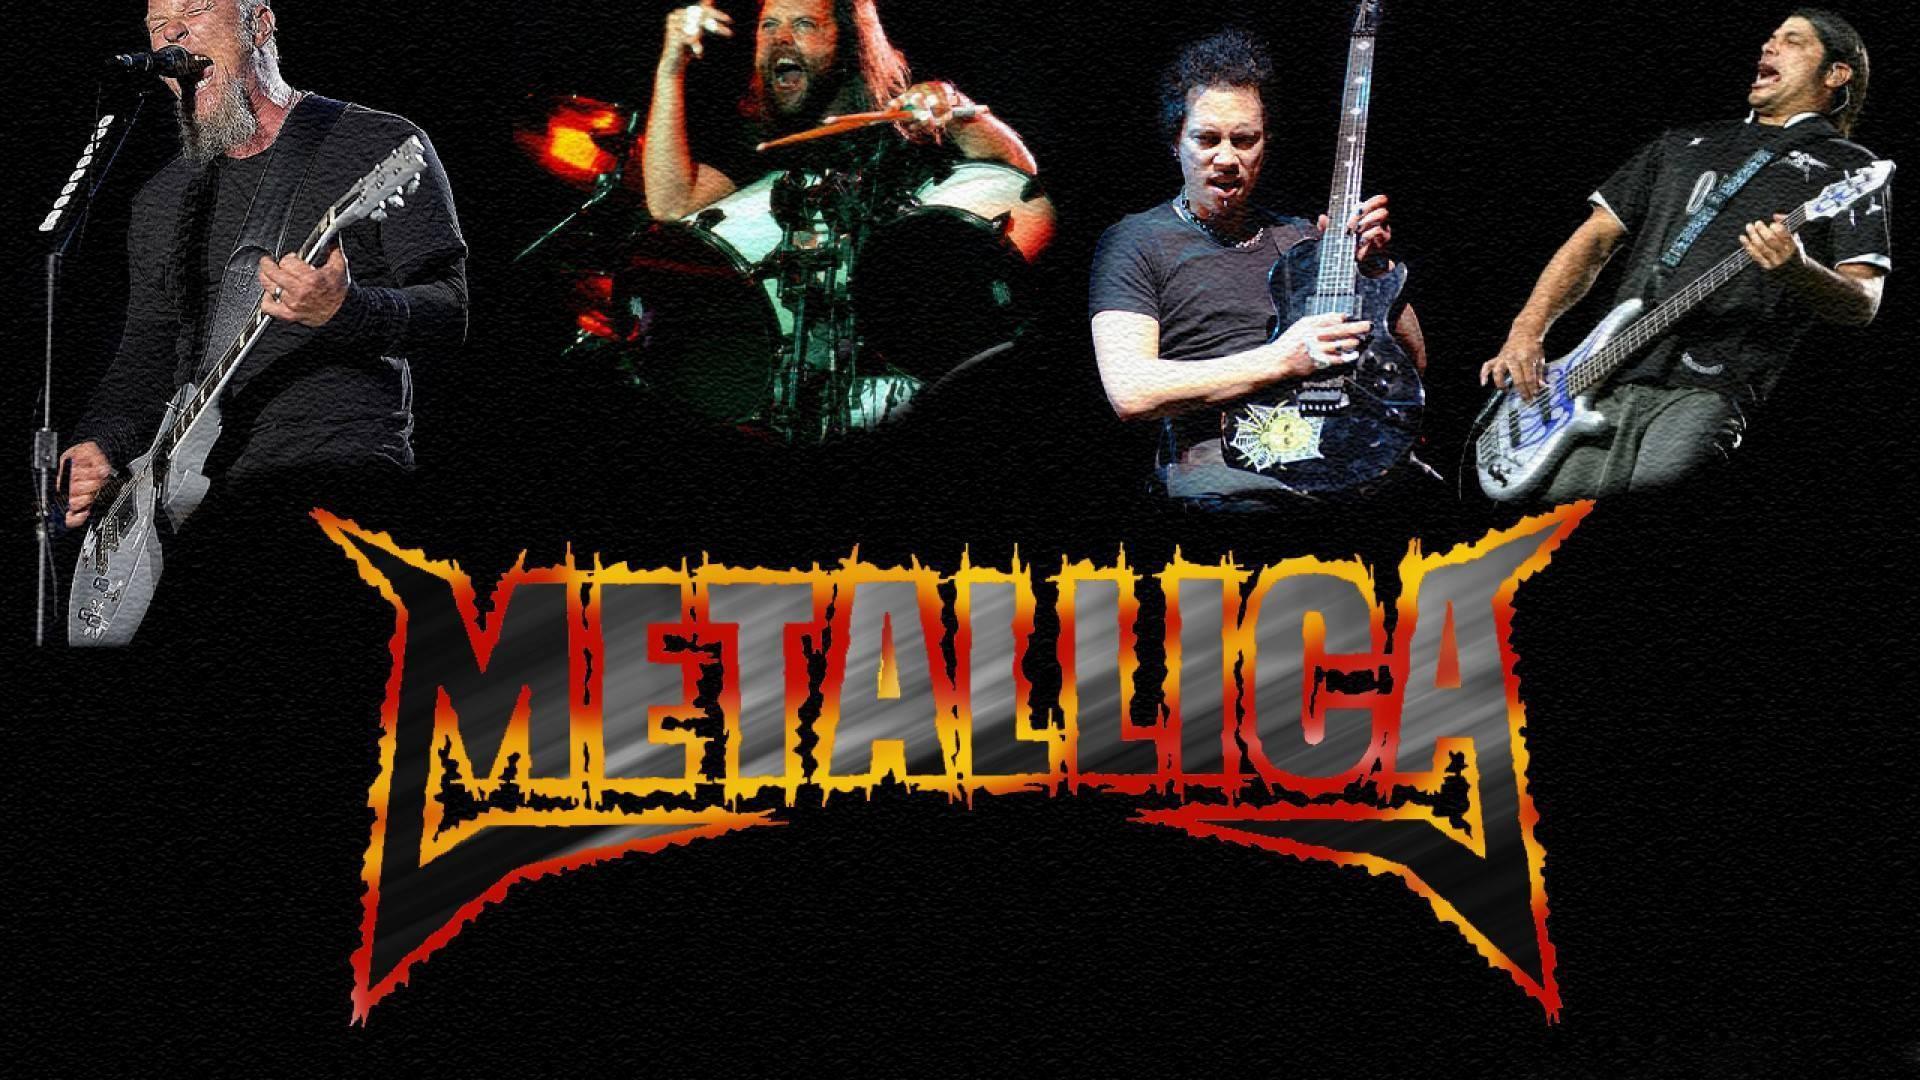 wallpaper.wiki-Metallica-wallpapers-1920×1080-PIC-WPE002767